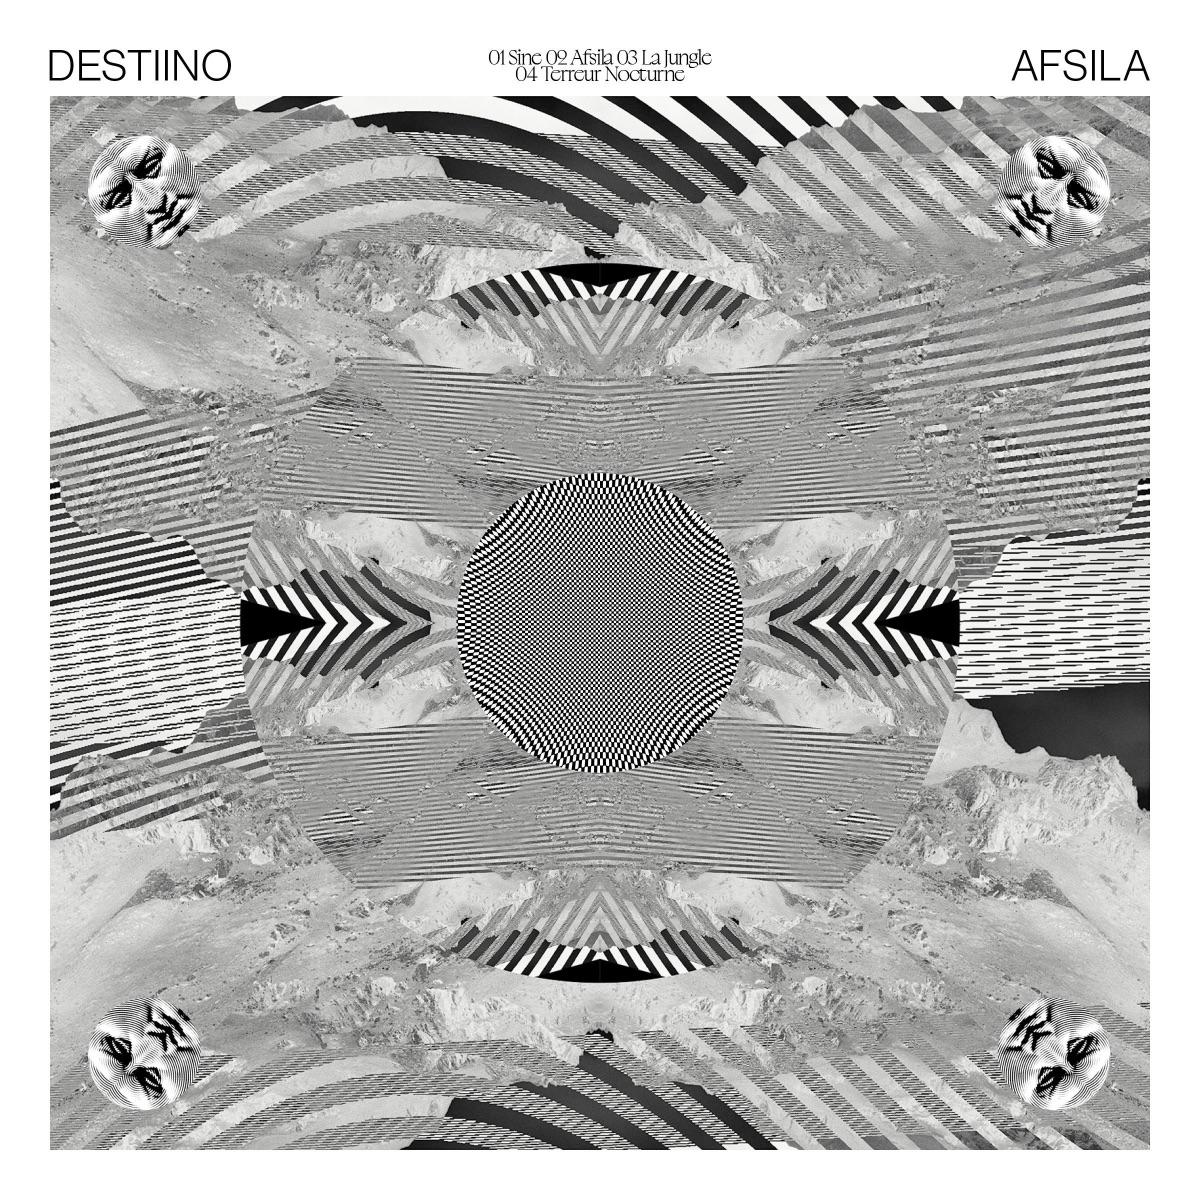 Yuksek reveals the first details of his new alias Destiino!